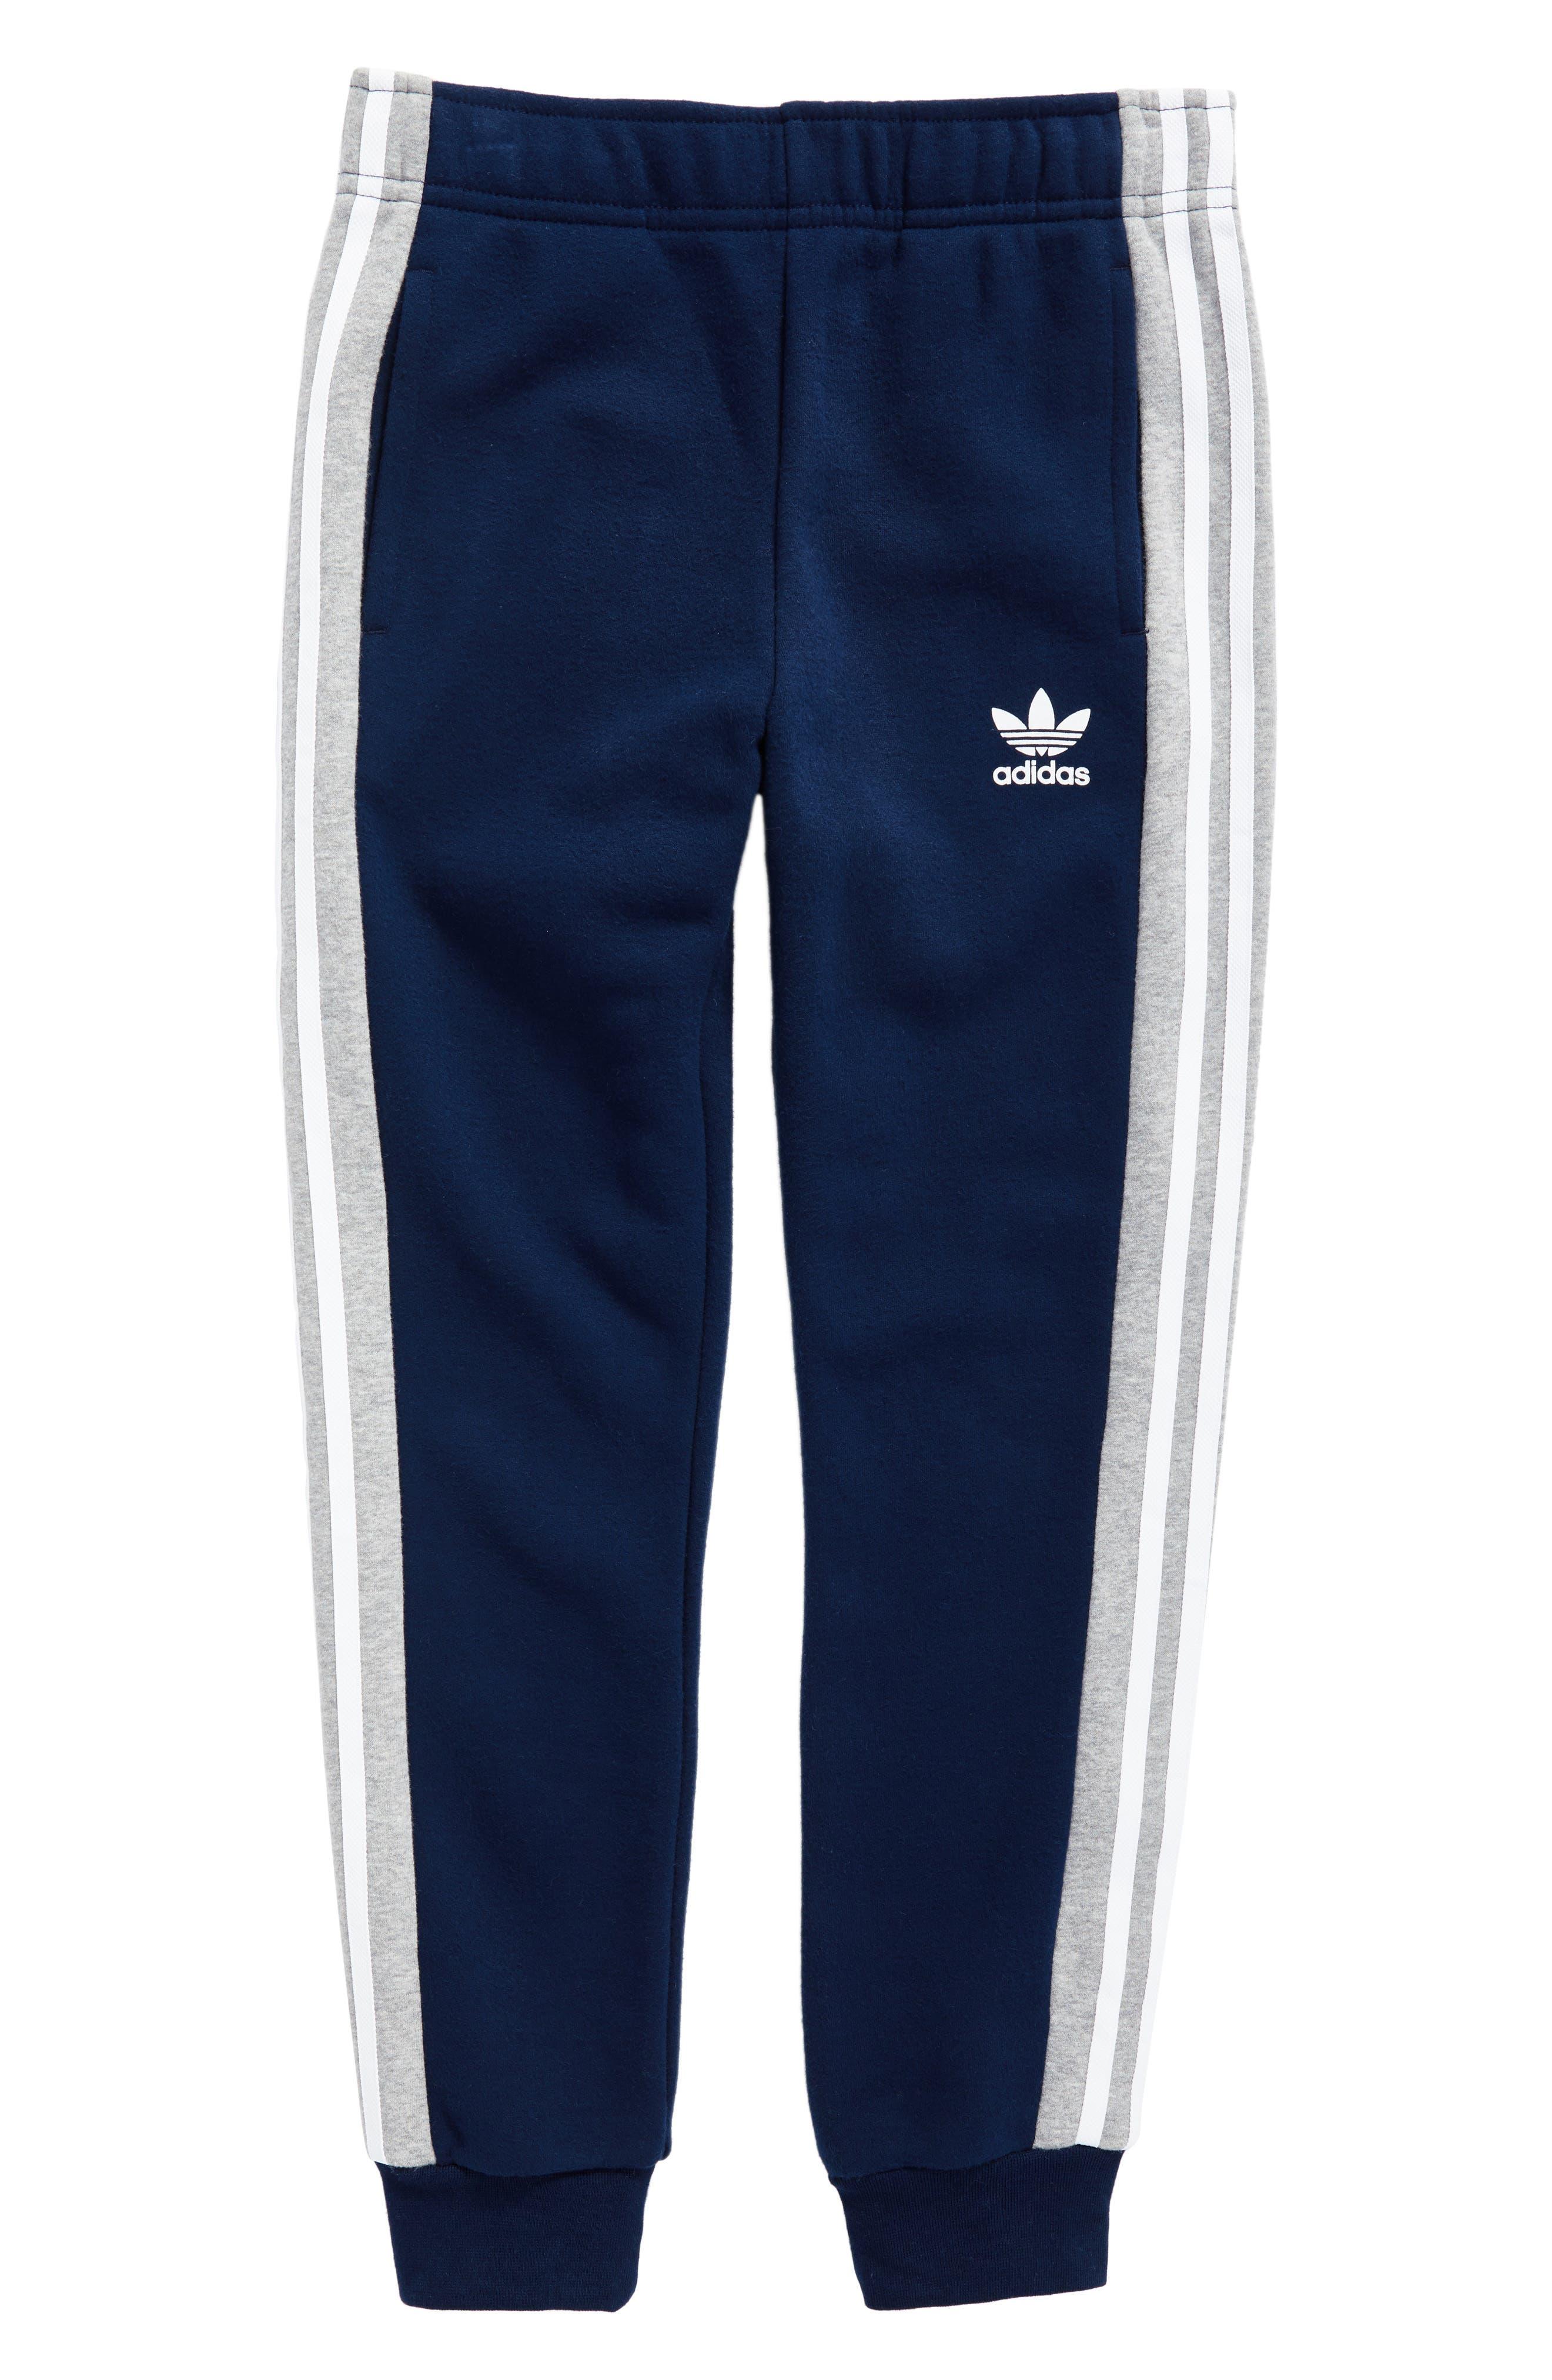 adidas FL Jogger Pants,                             Main thumbnail 1, color,                             Collegiate Navy/ Medium Grey